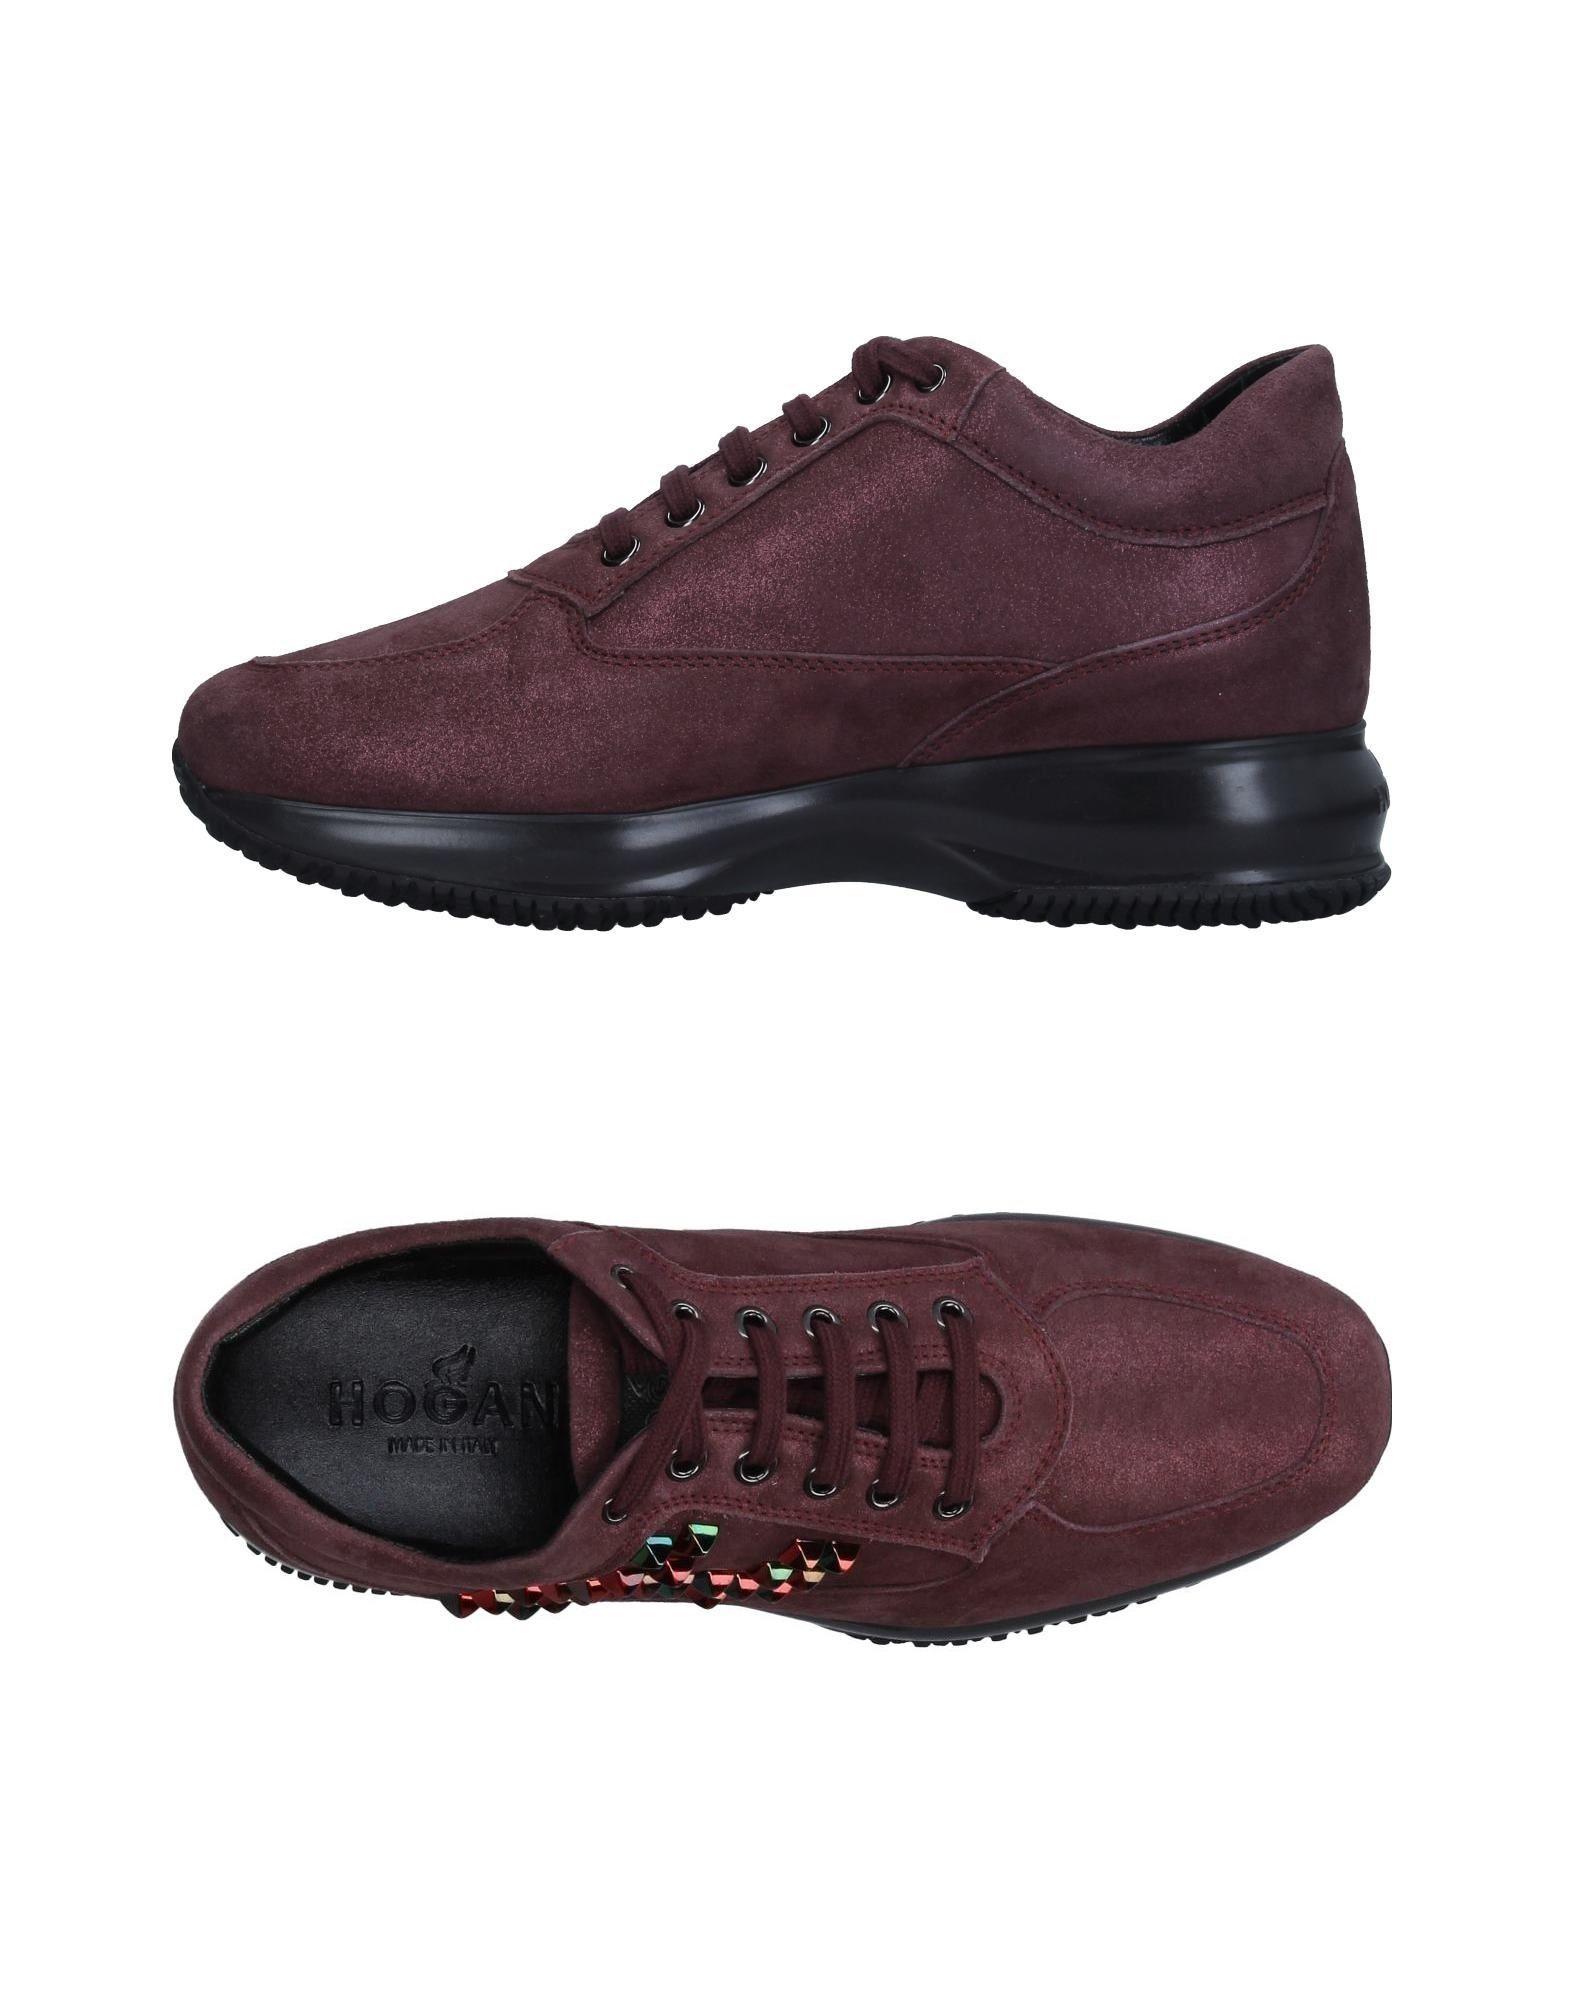 Hogan Sneakers Damen  11299118JWGut aussehende strapazierfähige Schuhe